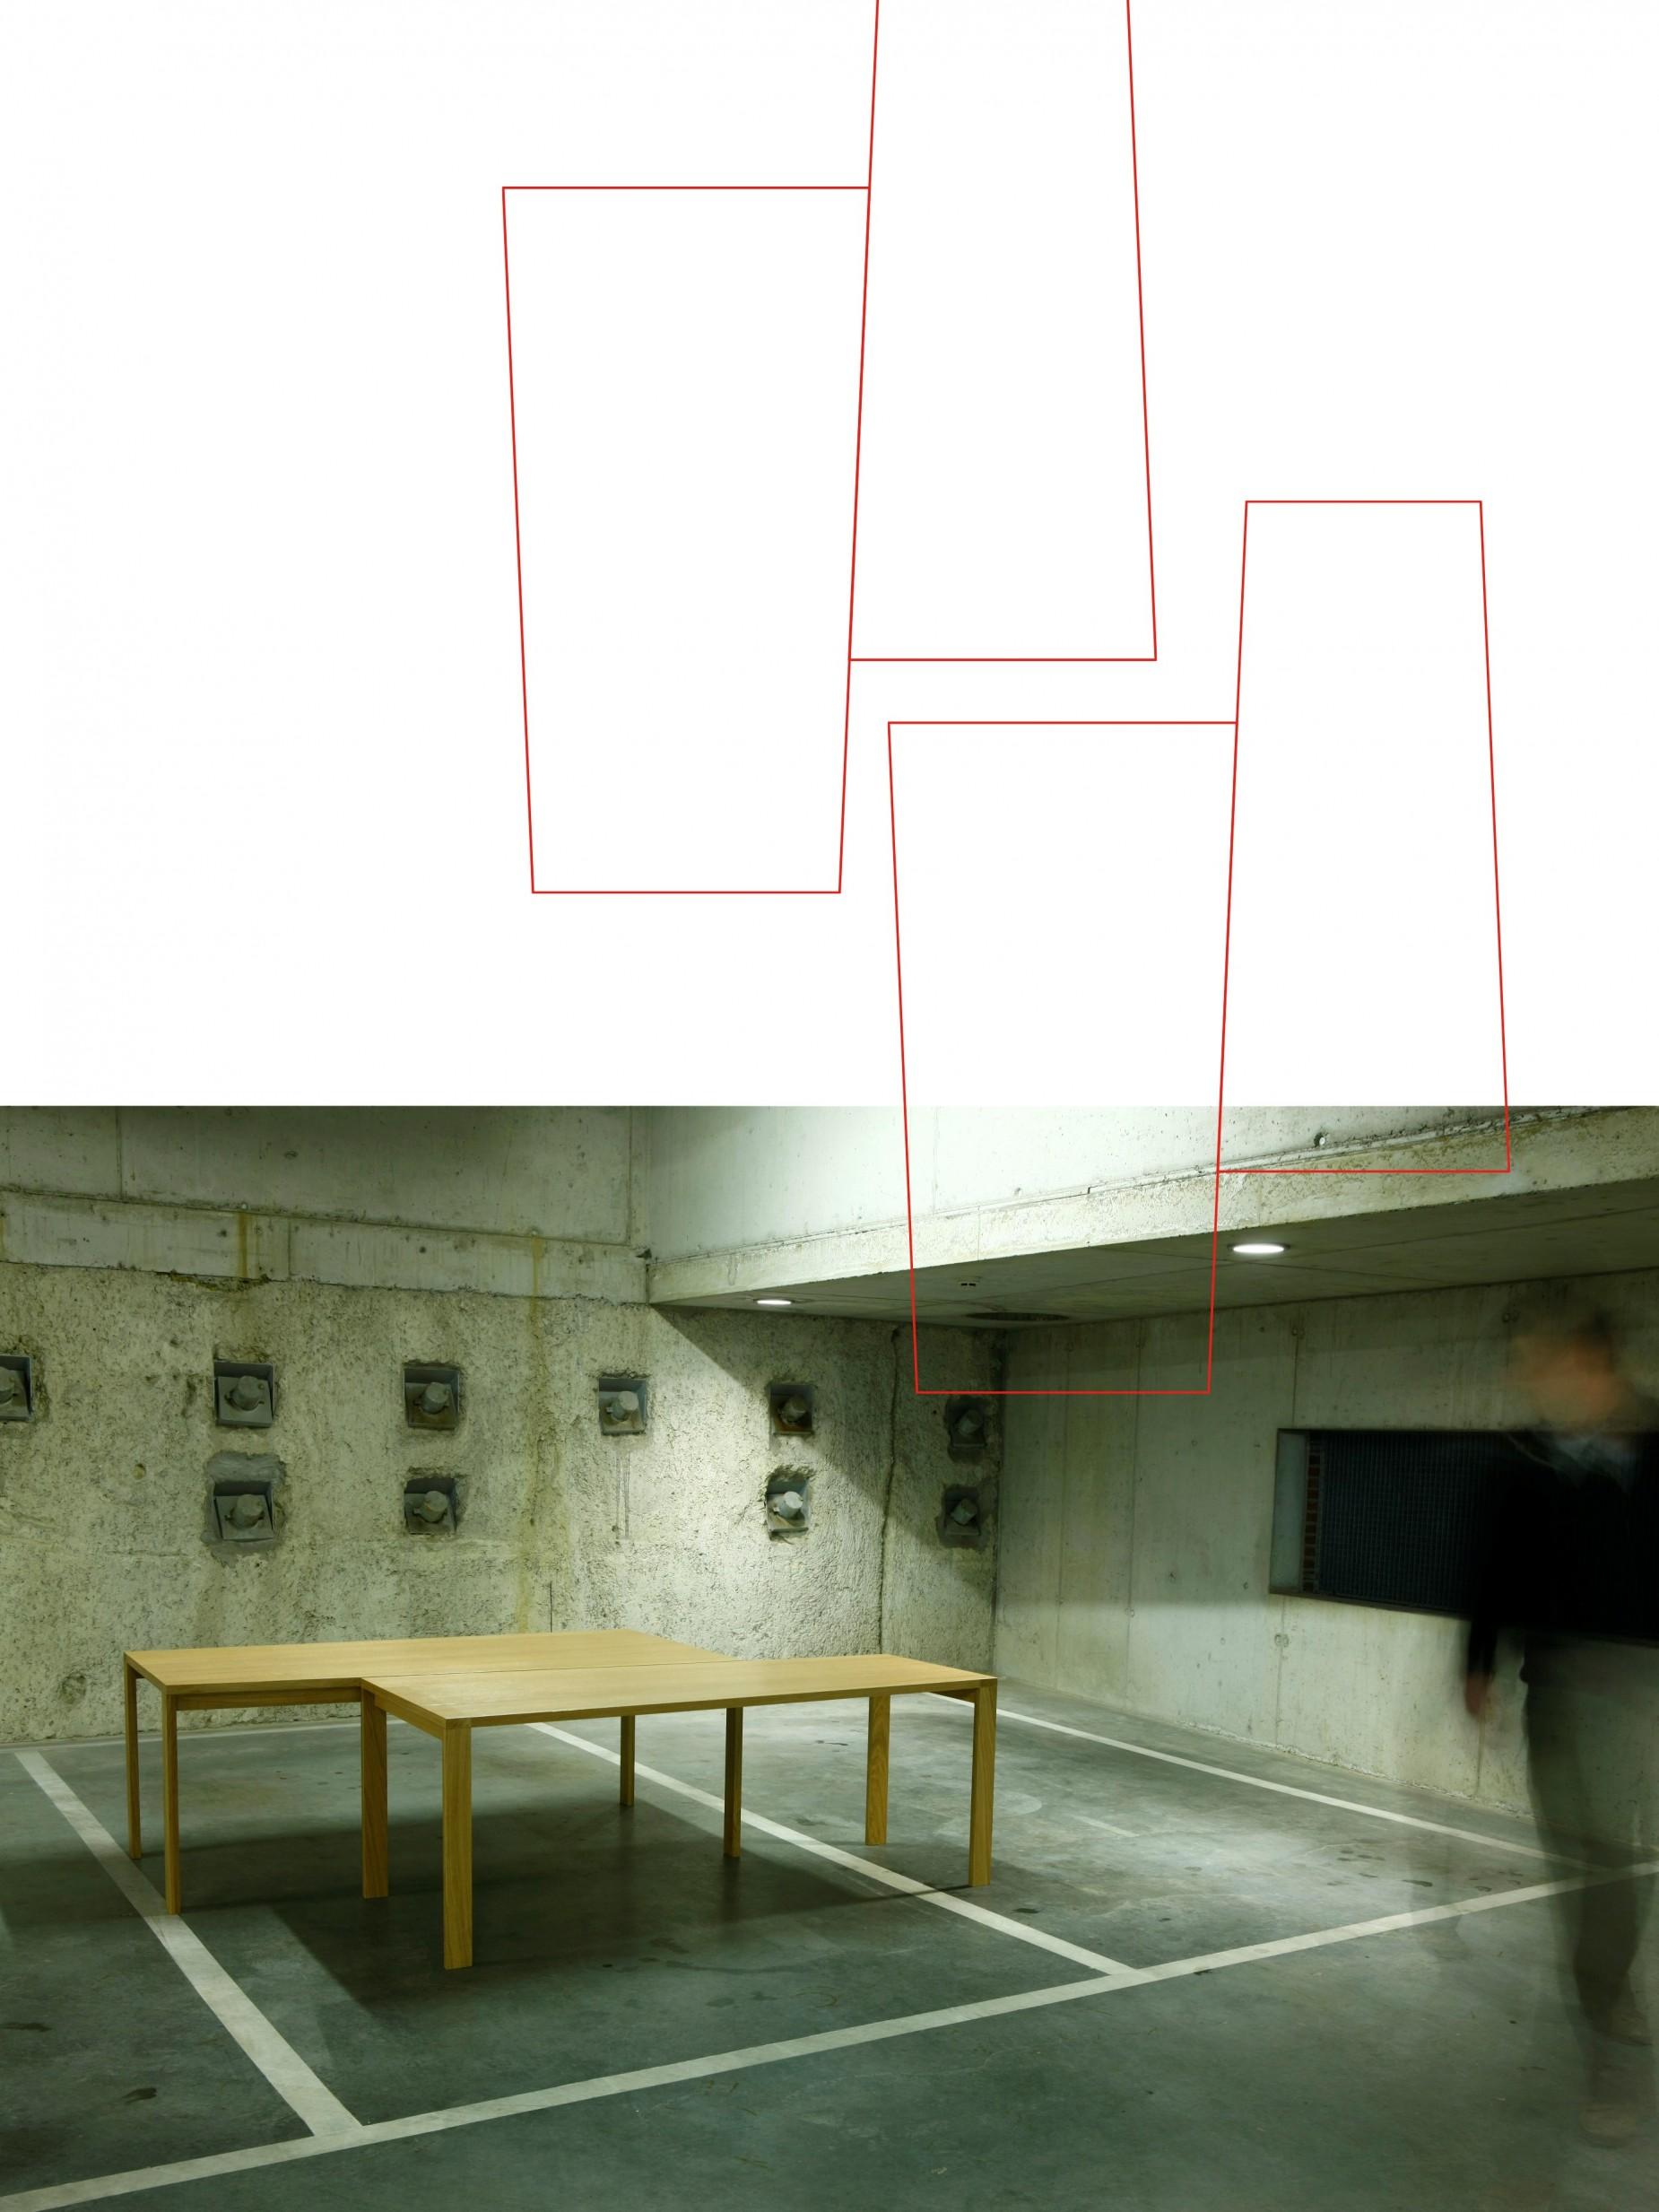 Net gemist: Tentoonstelling: Tafelen